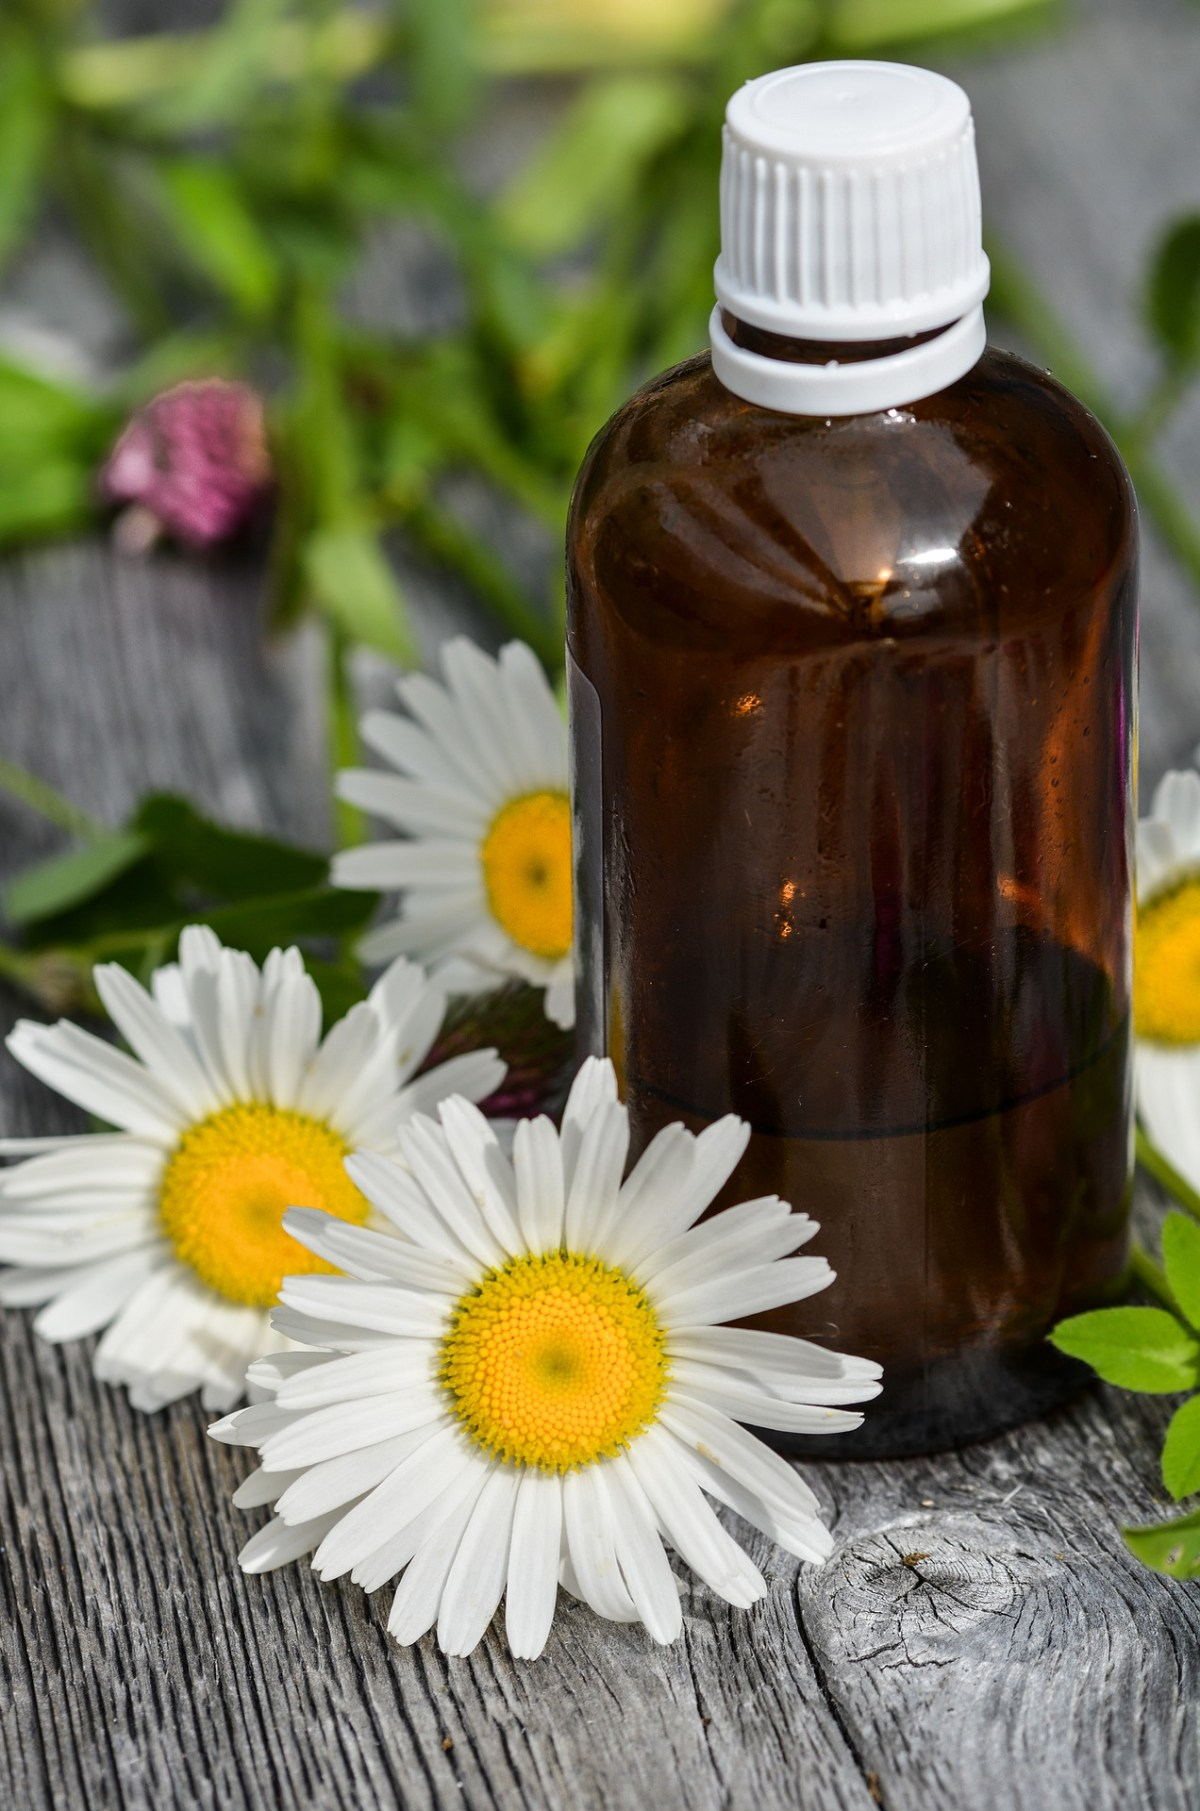 essential-oils-2536337_1920 (1).jpg